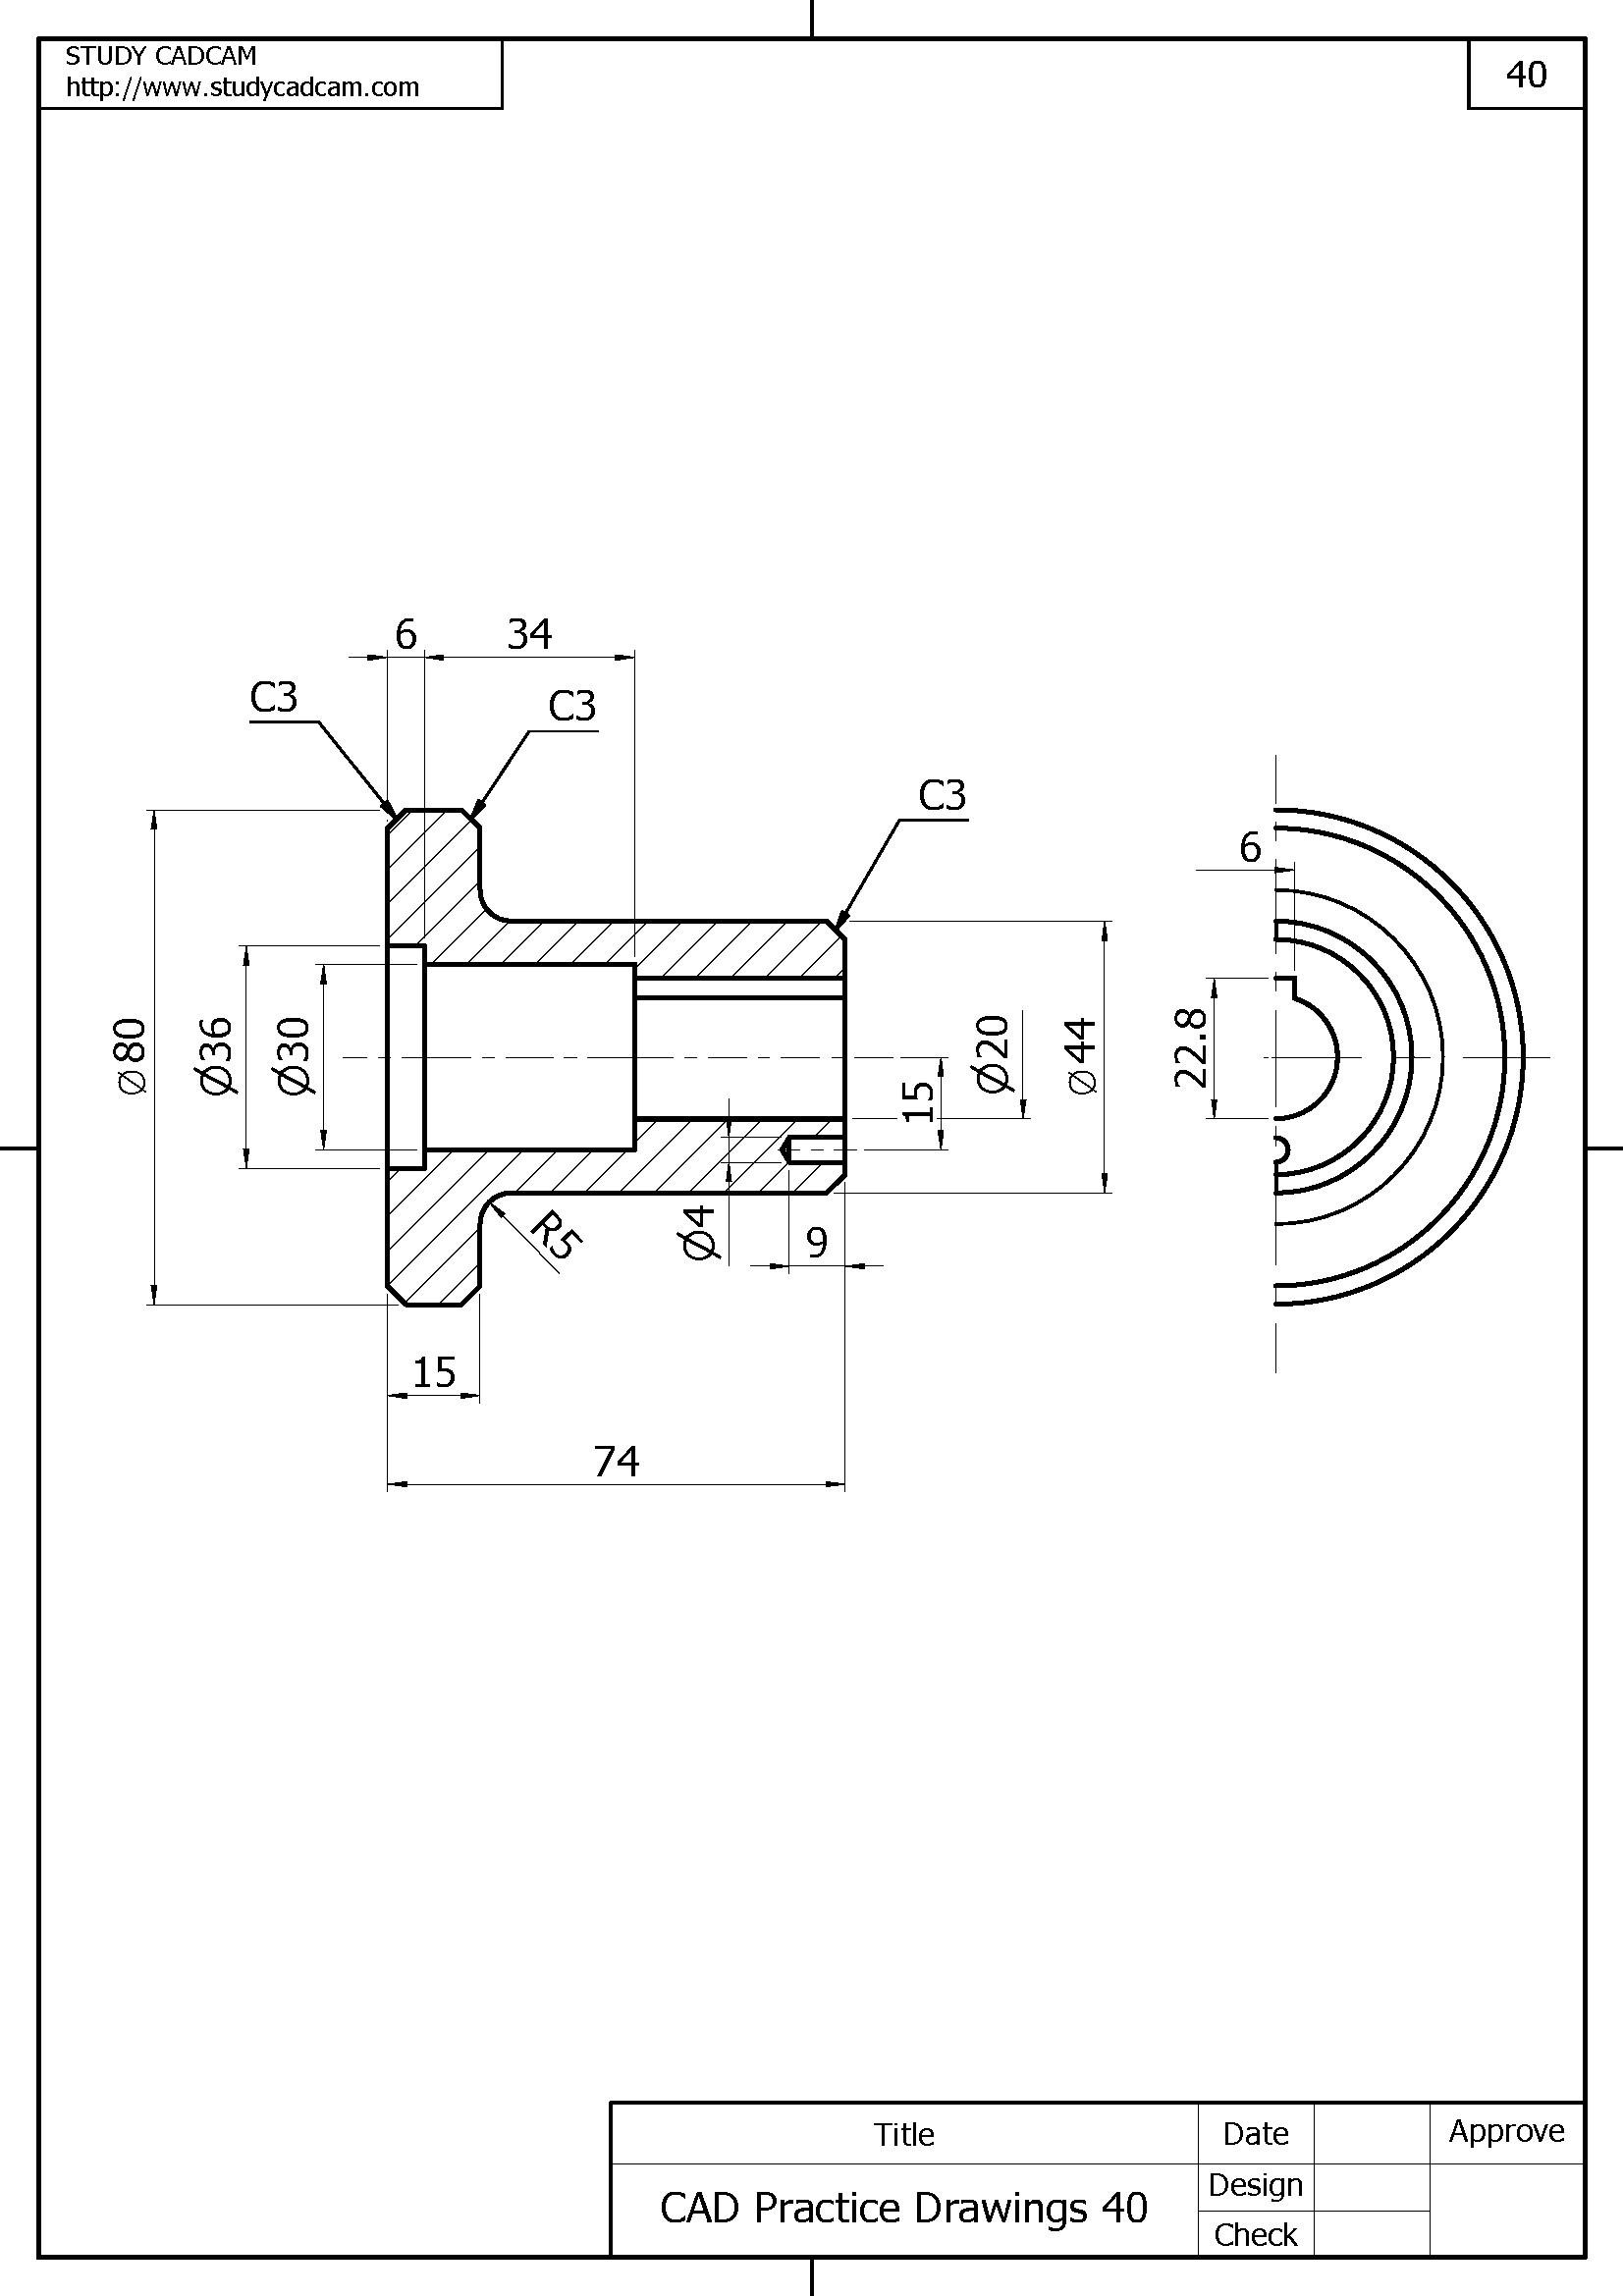 wb21x5243 wiring diagram - cad wiring diagram symbols fresh mechanical  engineering diagrams free electrical wiring diagrams